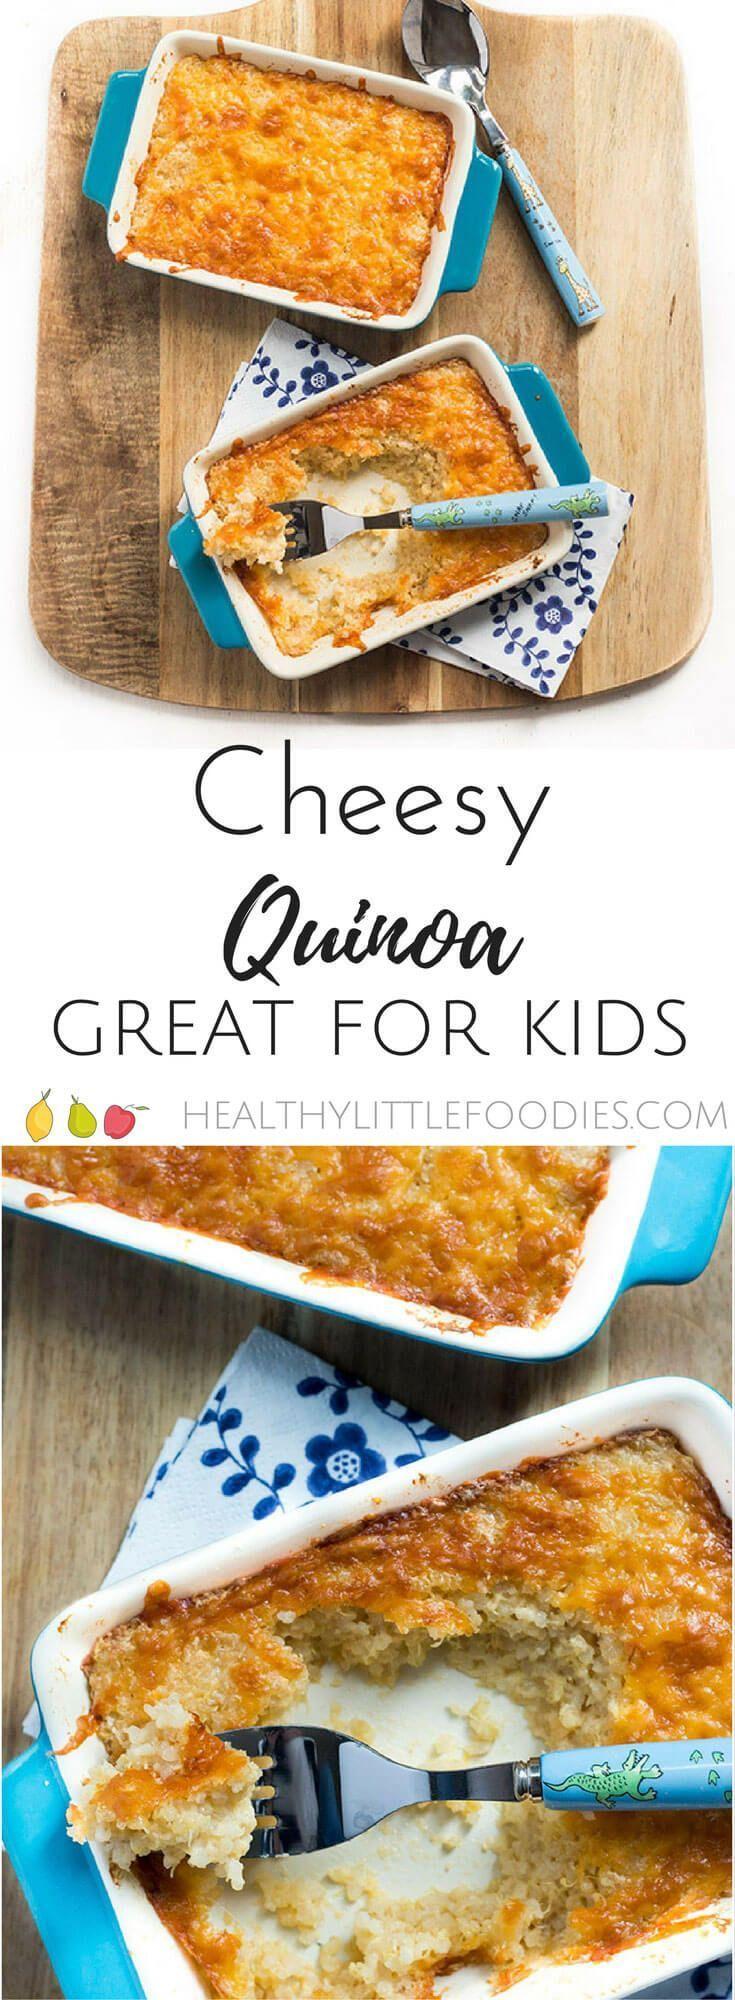 Cheesy Quinoa for Kids -  cheesy quinoa for kids. Cooked quinoa mixed into a cheese sauce and then